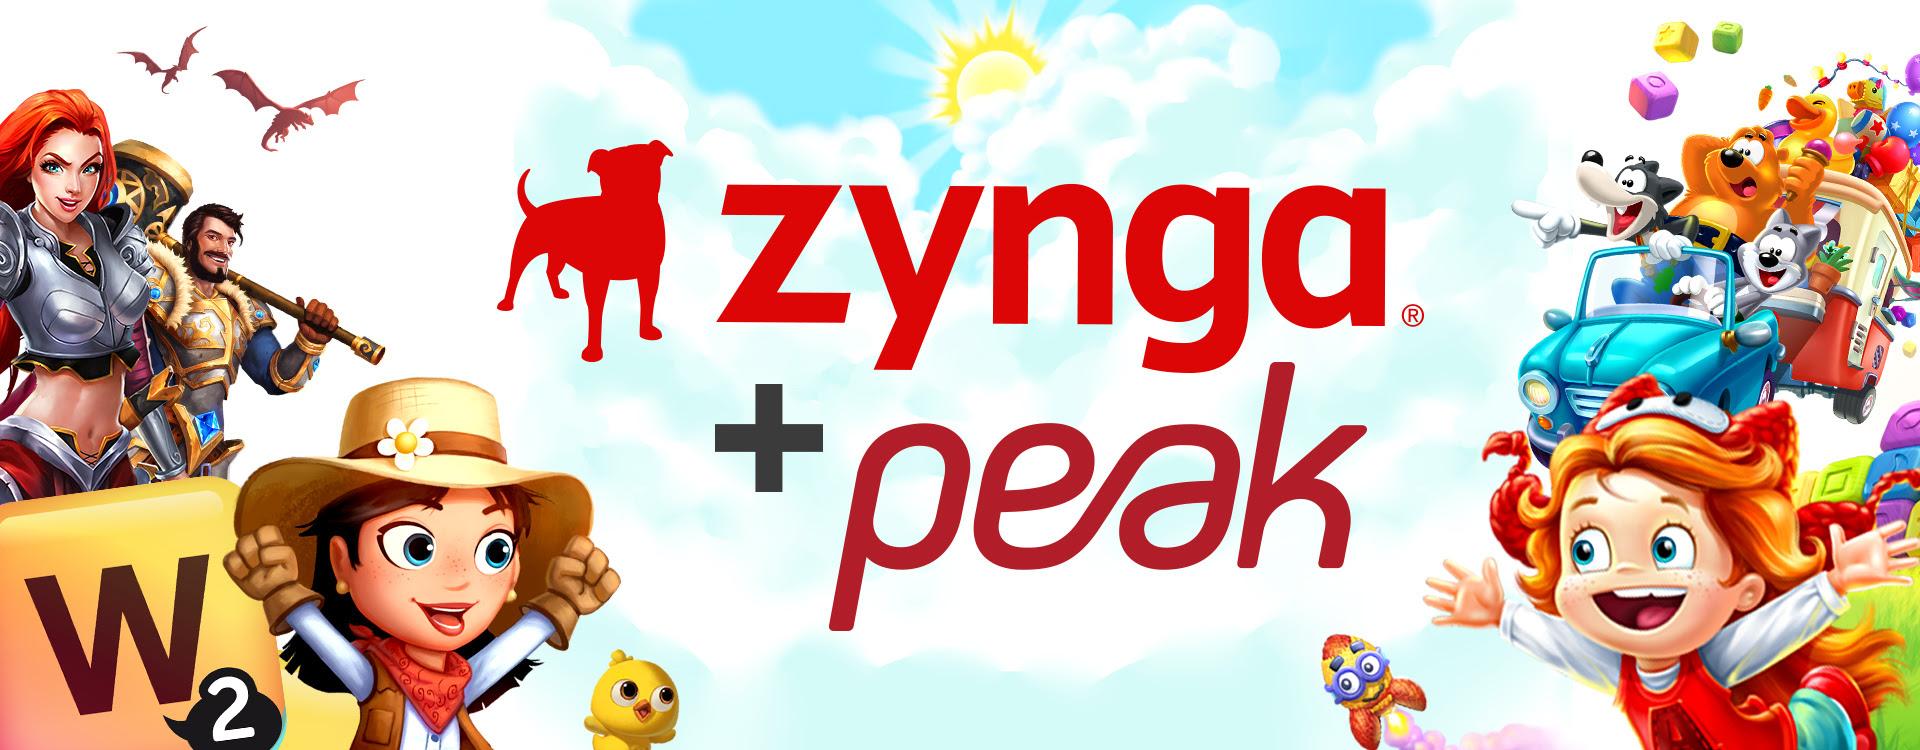 https://techcrunch.com/wp-content/uploads/2020/06/zynga-peak.jpg